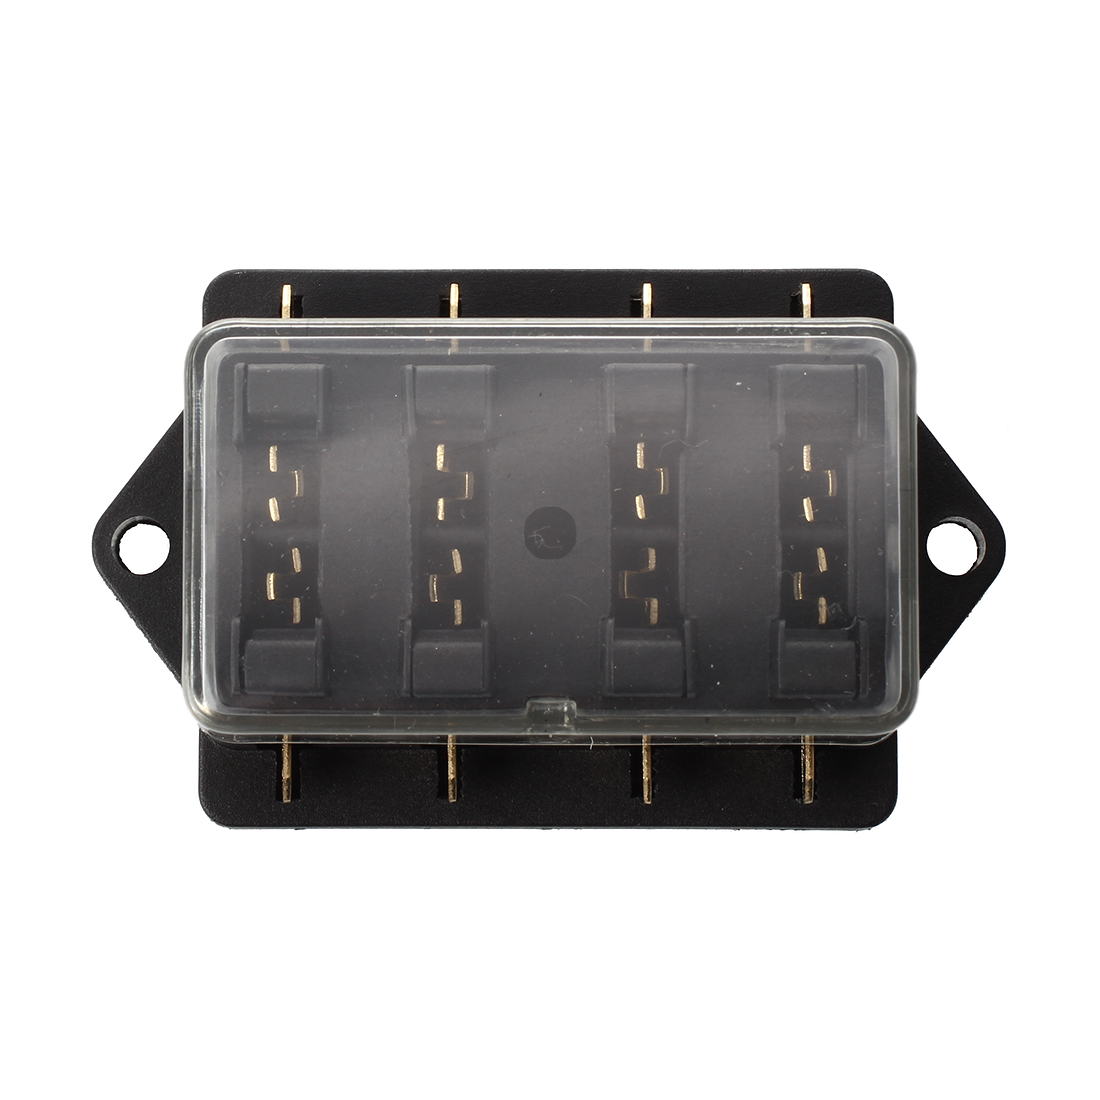 4 compartment fuse box fuse holder fur car auto blade type. Black Bedroom Furniture Sets. Home Design Ideas